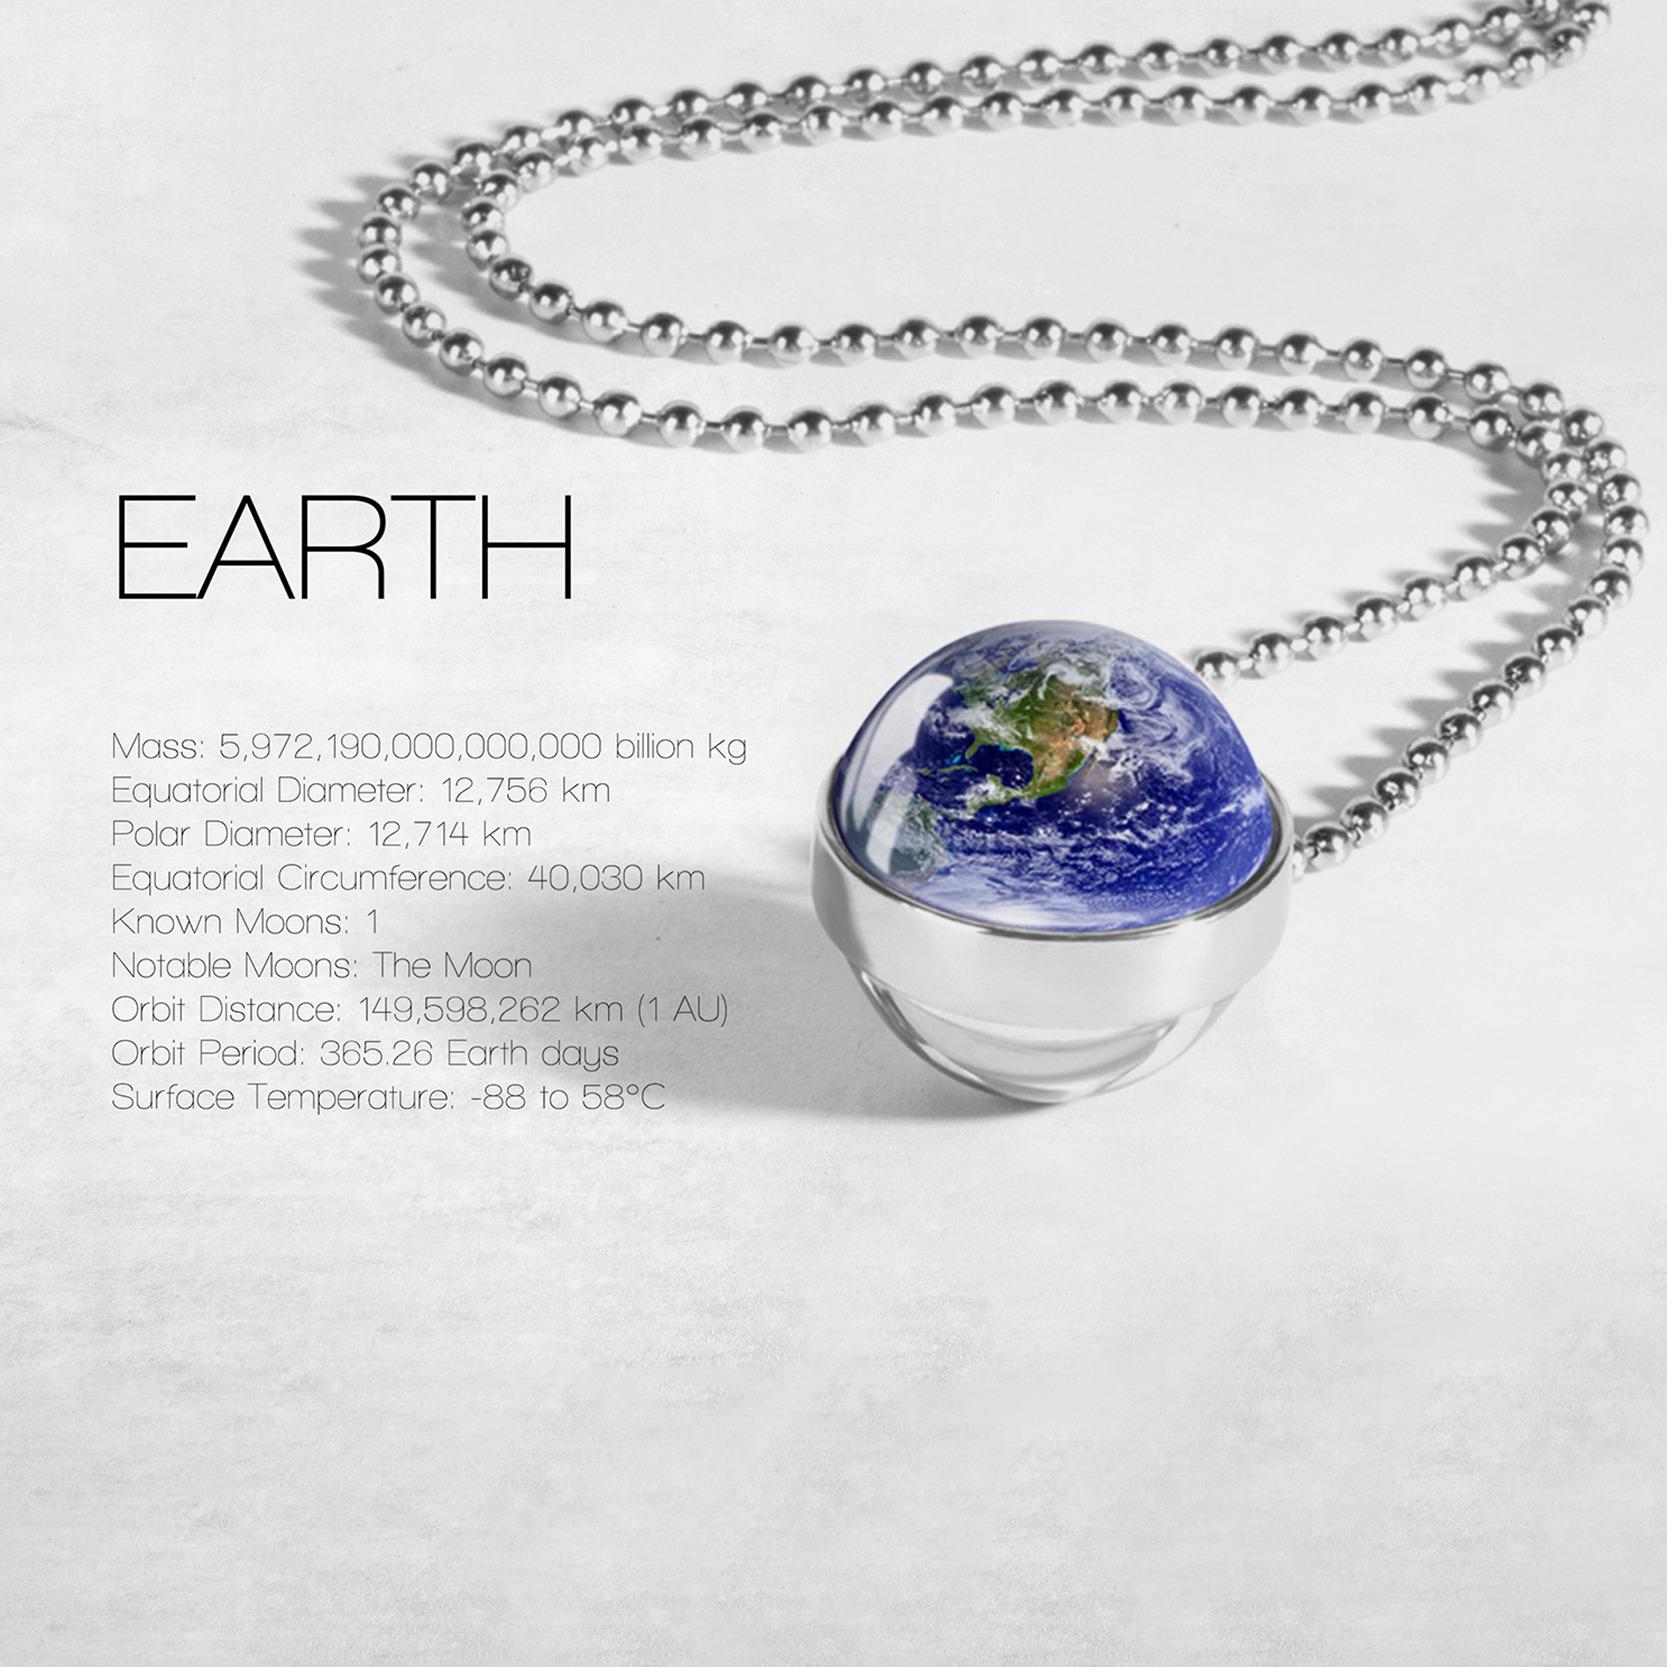 Globe Double Sided Necklace Solar System Planet Venus Mercury Mars Saturn Uranus Neptune Earth Sun Pendant Dome Glass Necklaces 2